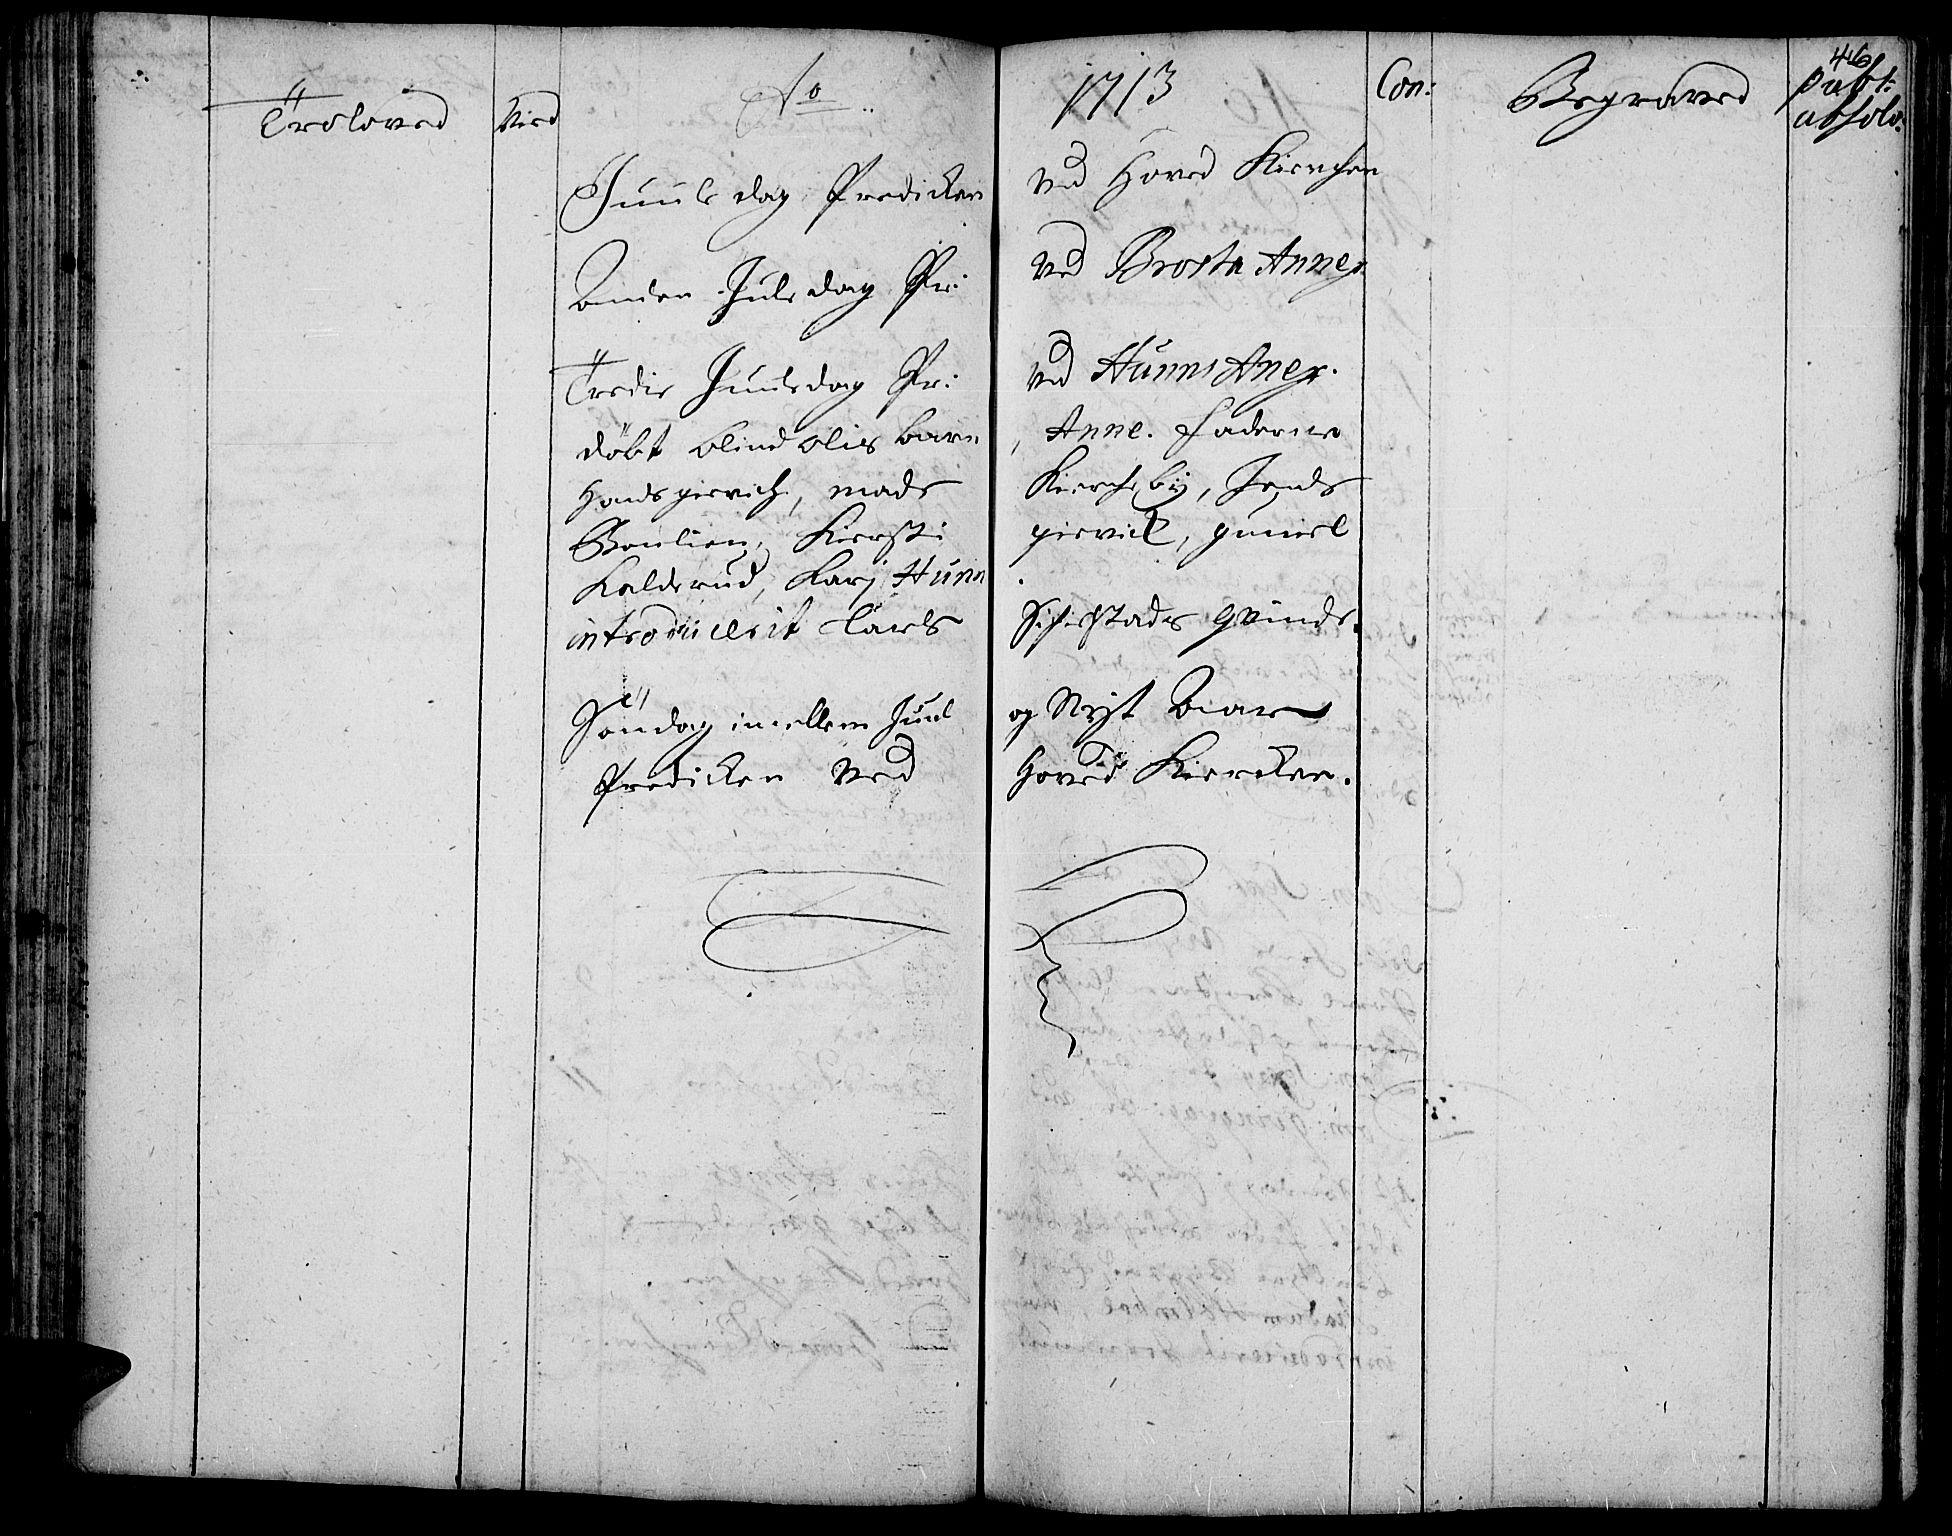 SAH, Vardal prestekontor, H/Ha/Haa/L0001: Ministerialbok nr. 1, 1706-1748, s. 46